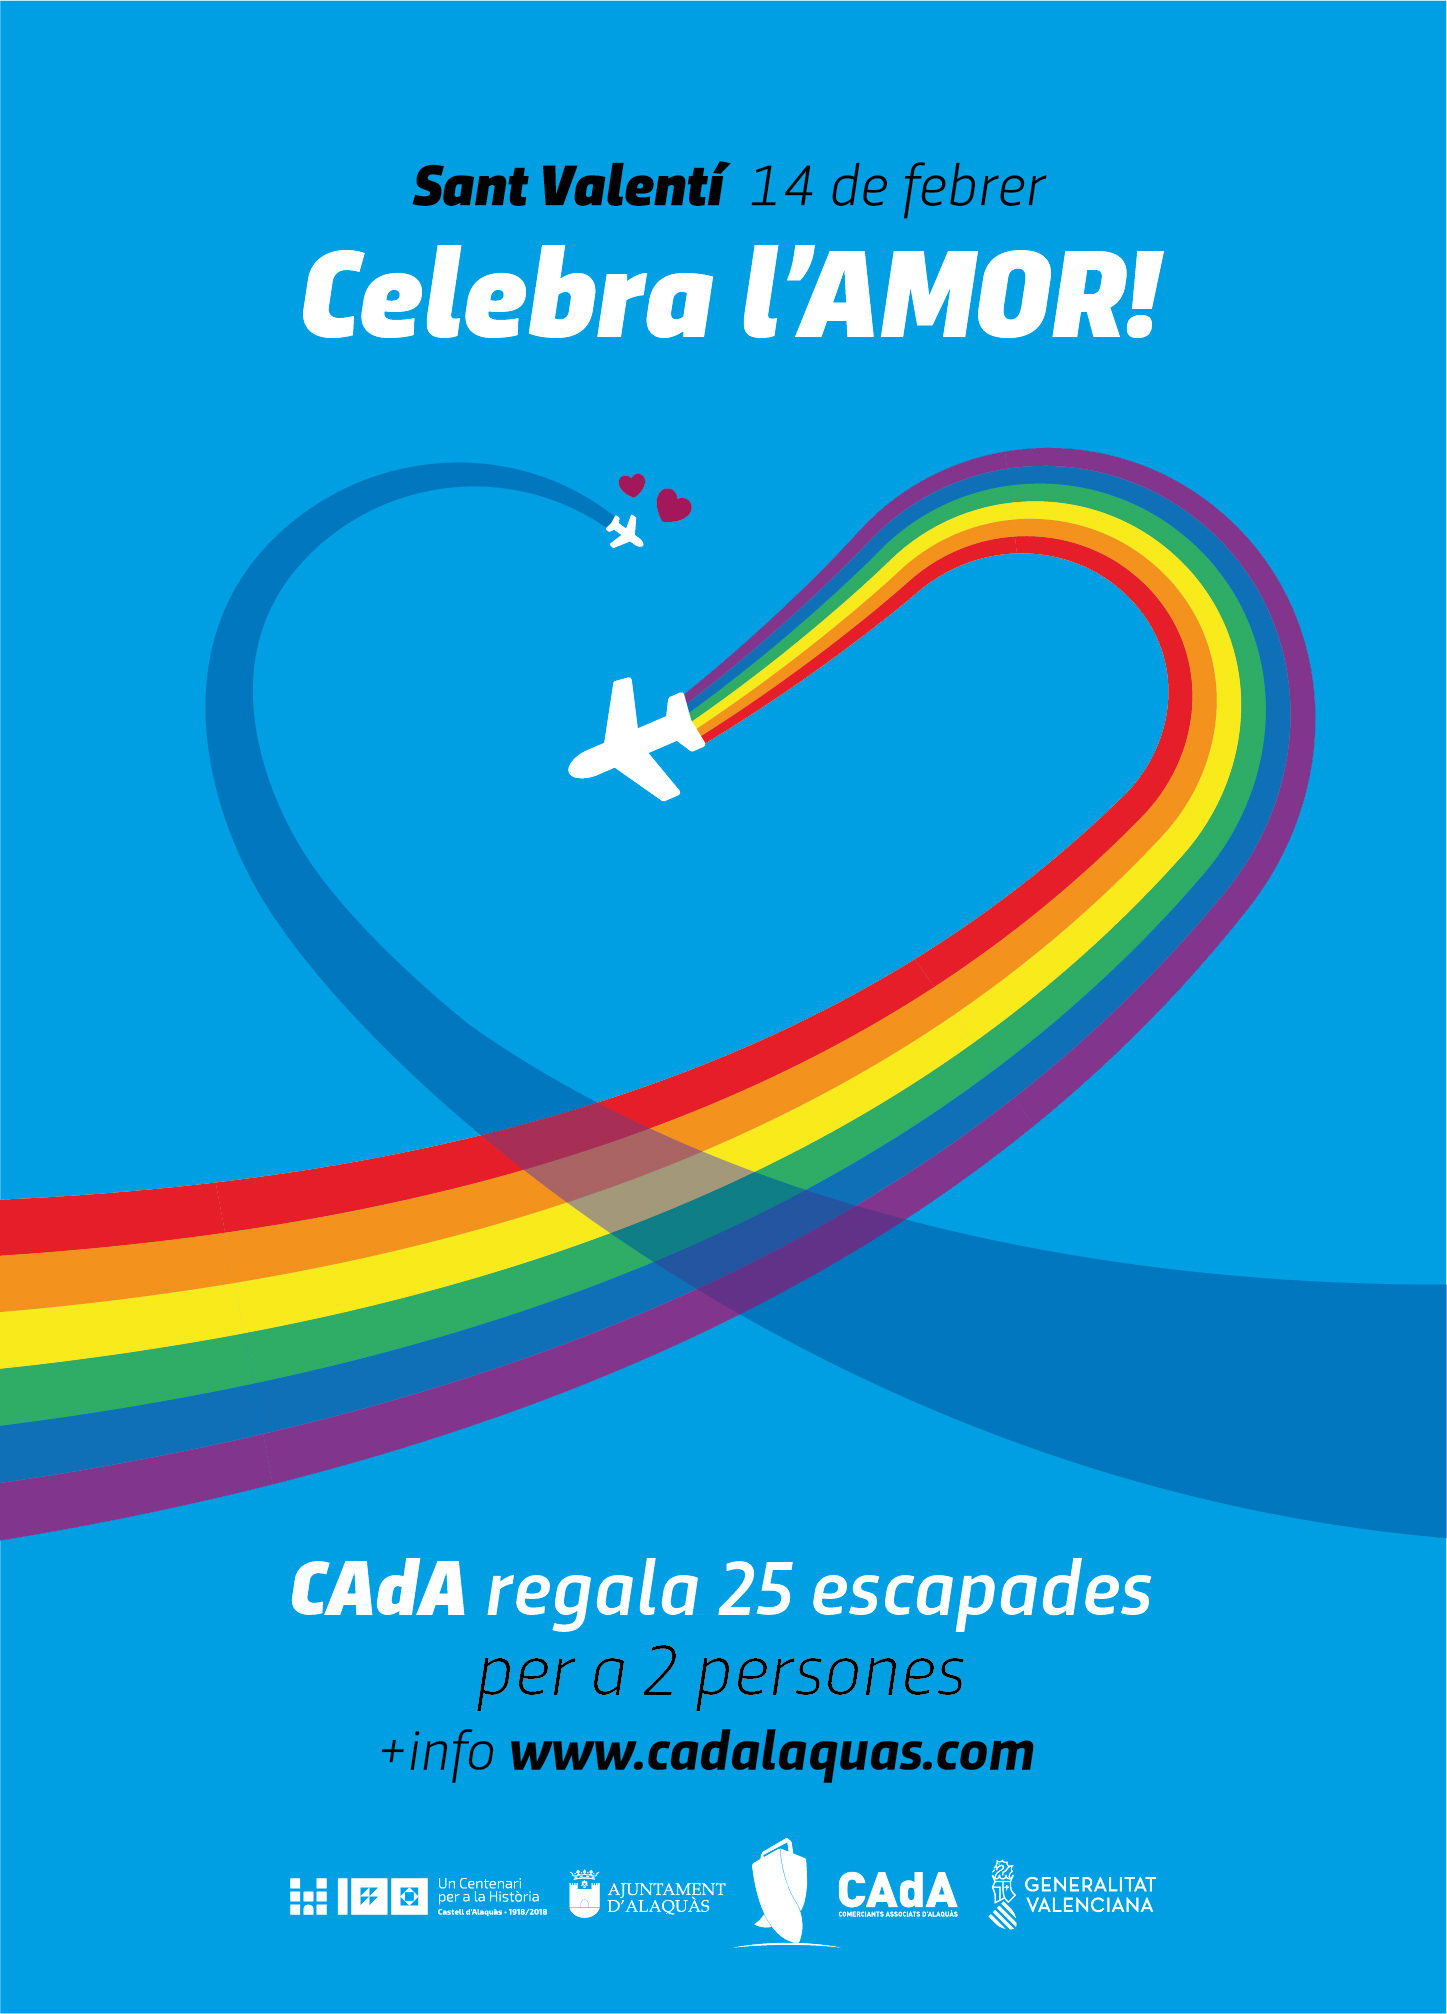 CAdA-SanValentin-sorteo-2019-escapada-viaje-amor